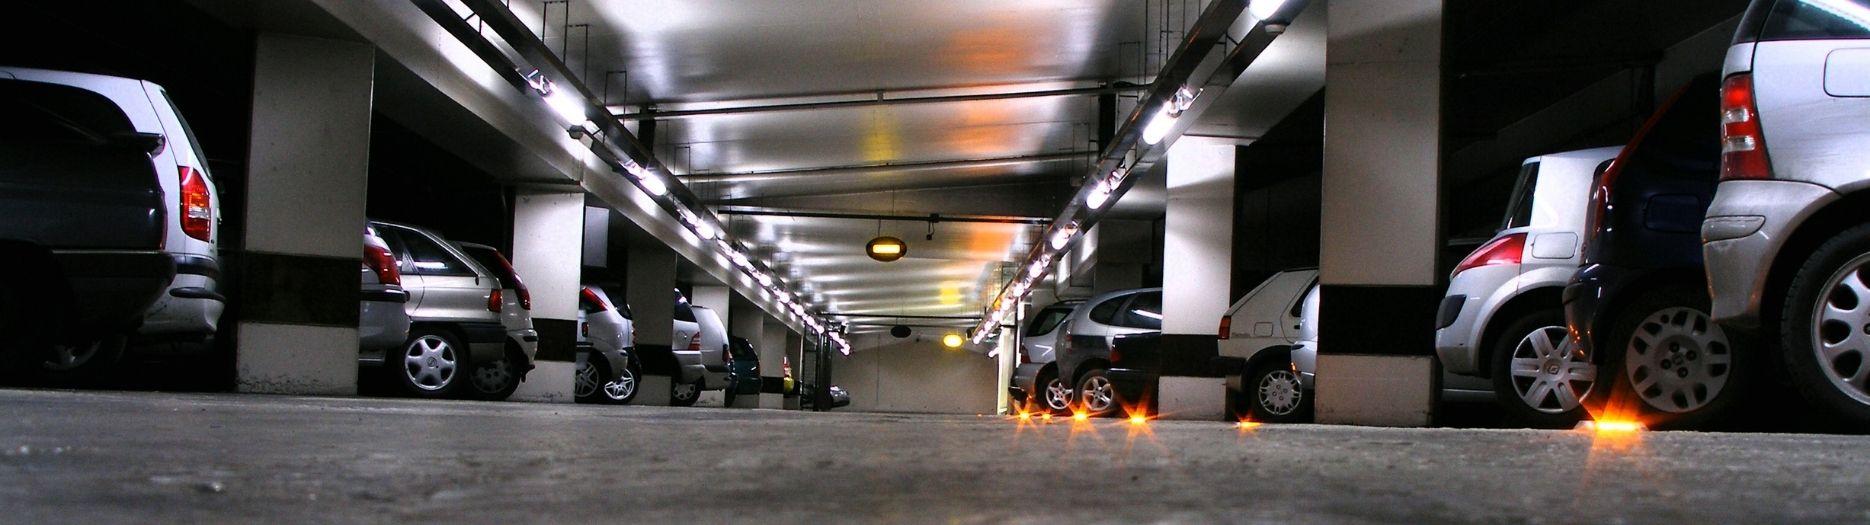 1870x525_MF website_Carpark